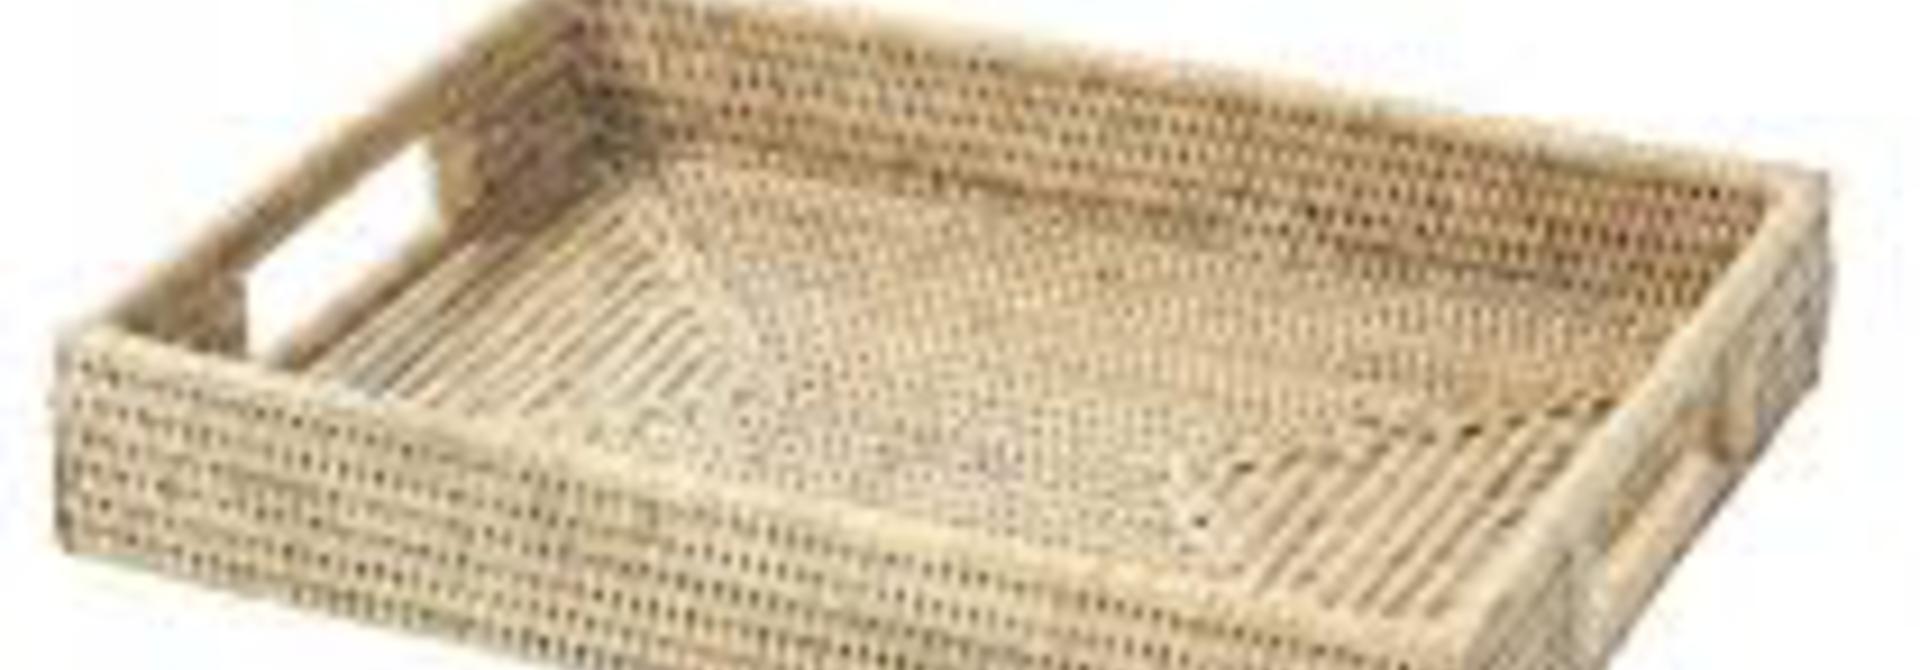 PAGAN - Babette Ceruse Rattan Tray 36x25x6cm